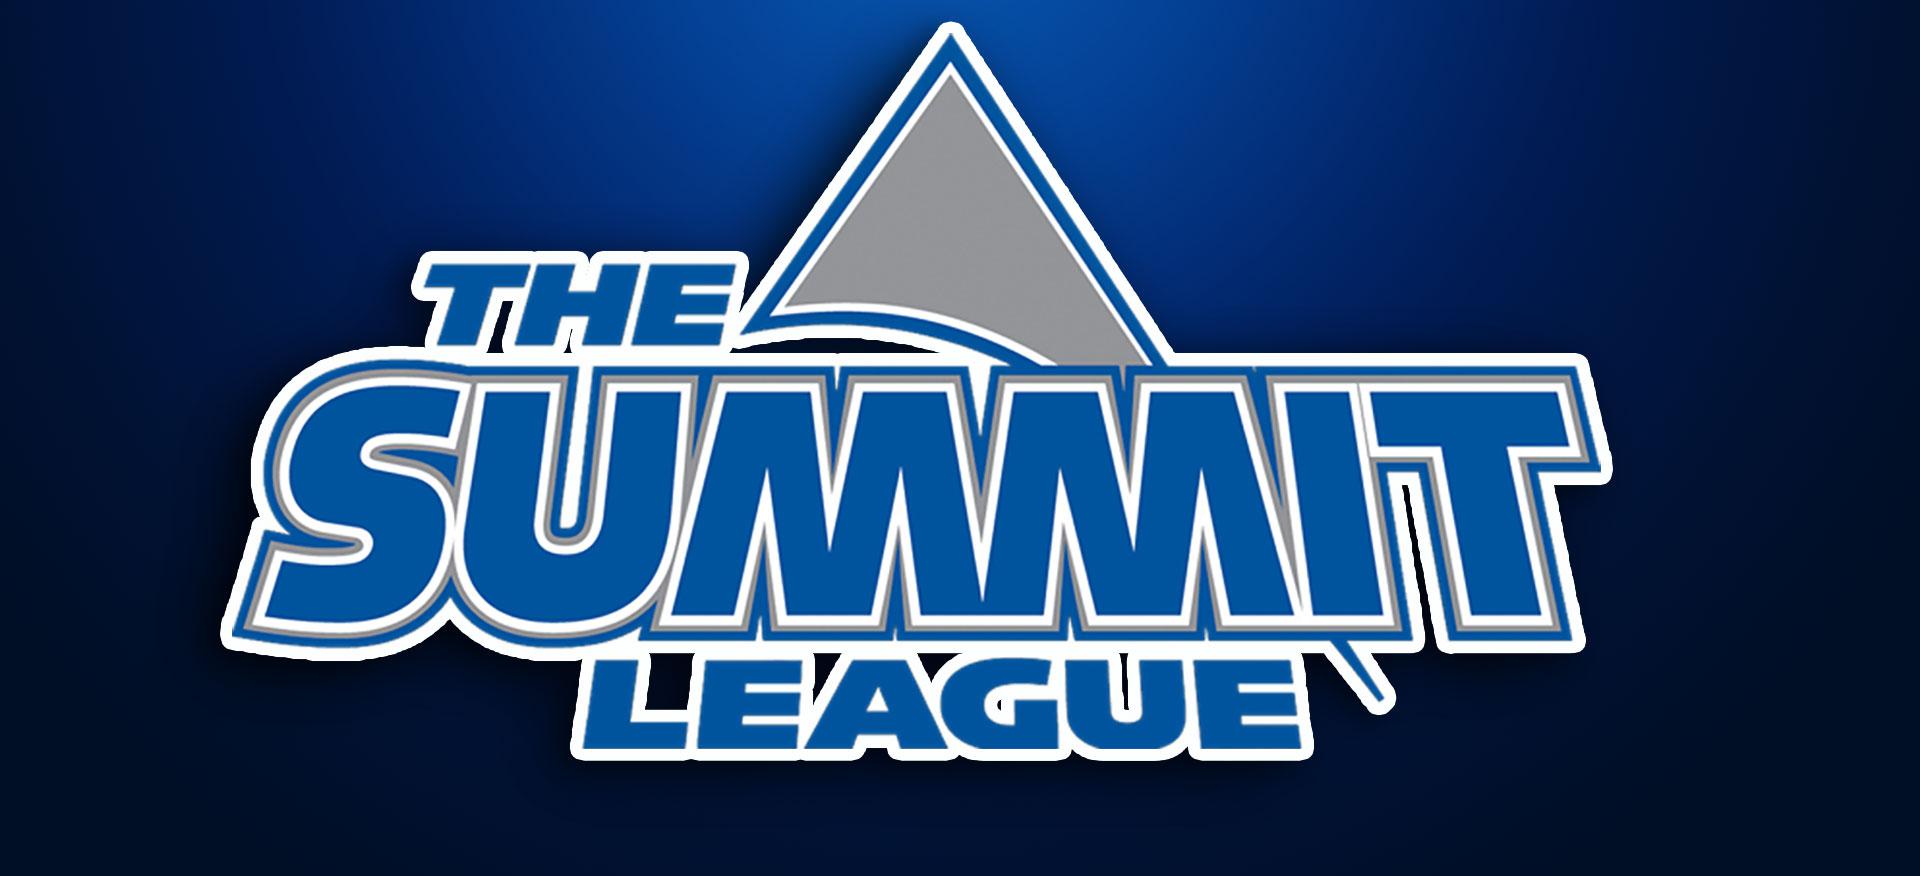 KELO The Summit League logo